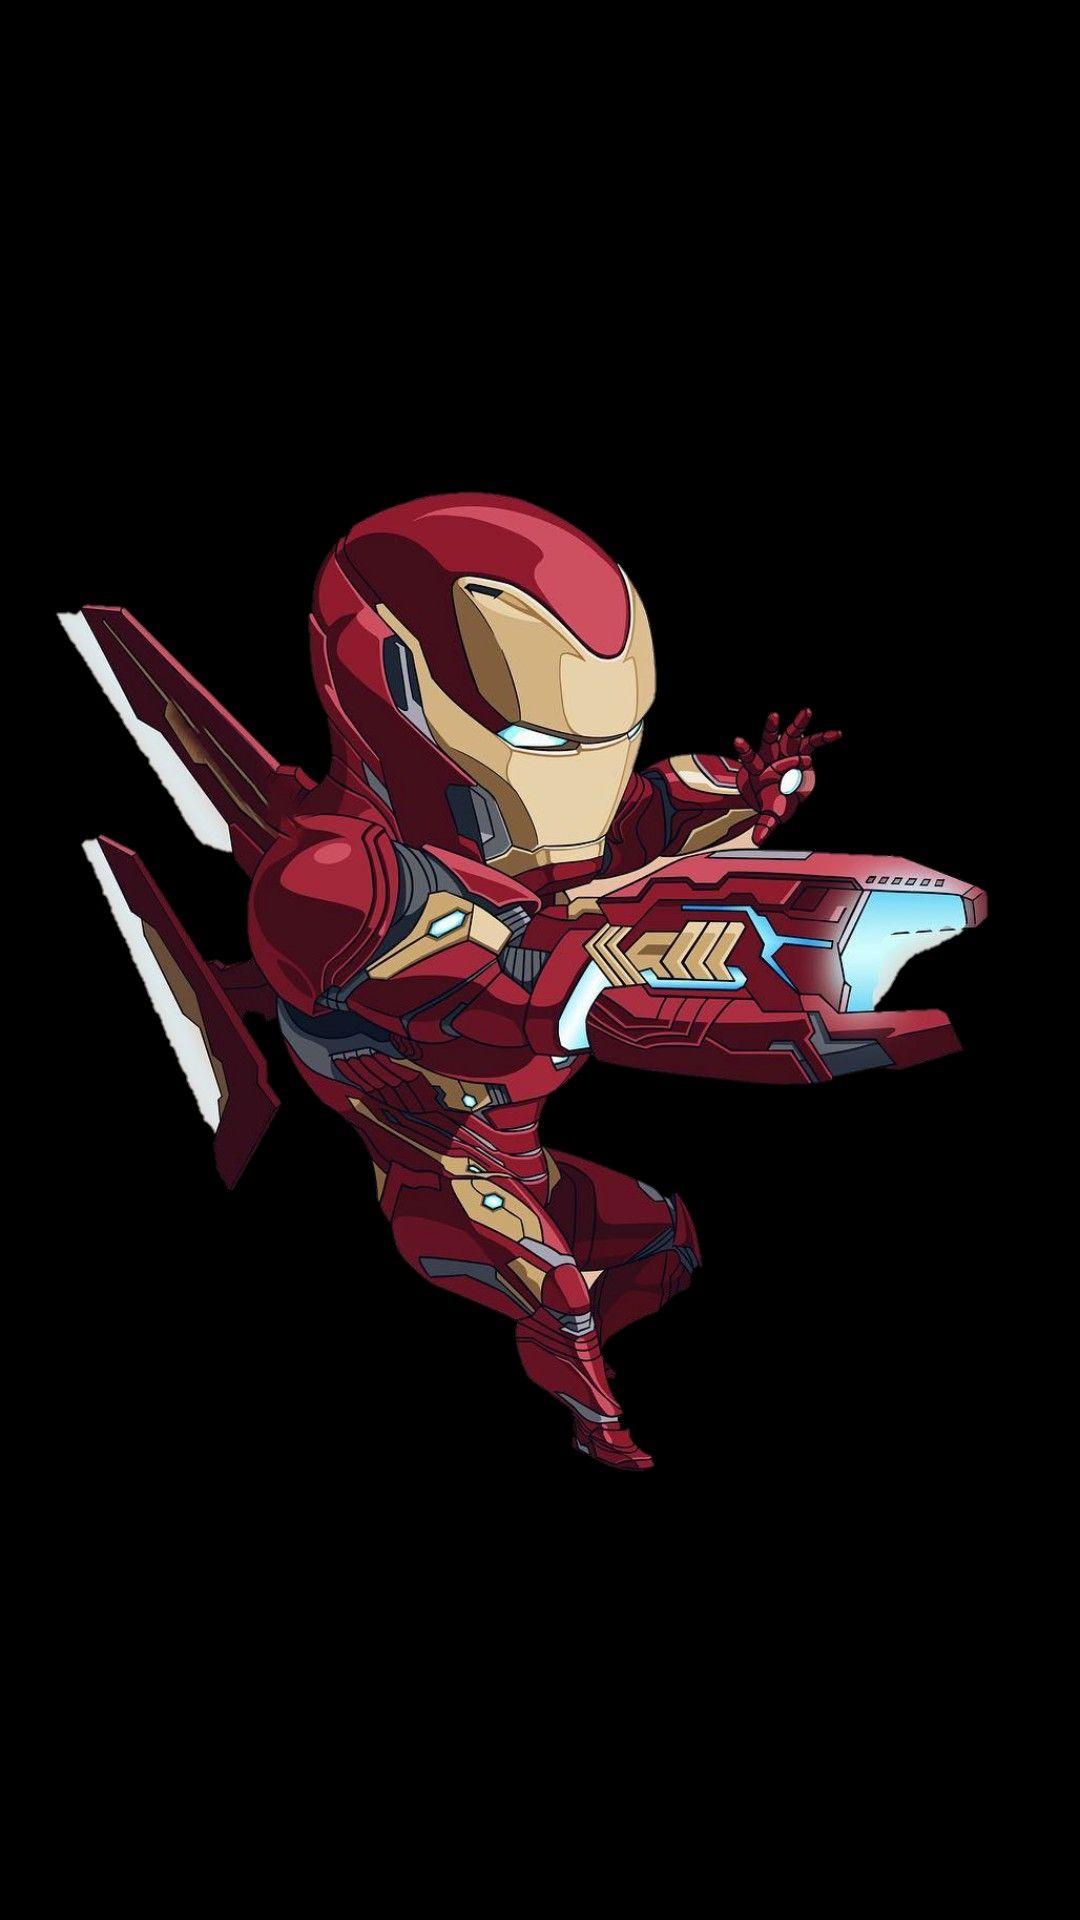 Iron Man Infinity War Minimal iPhone Wallpaper iphoneswallpapers com